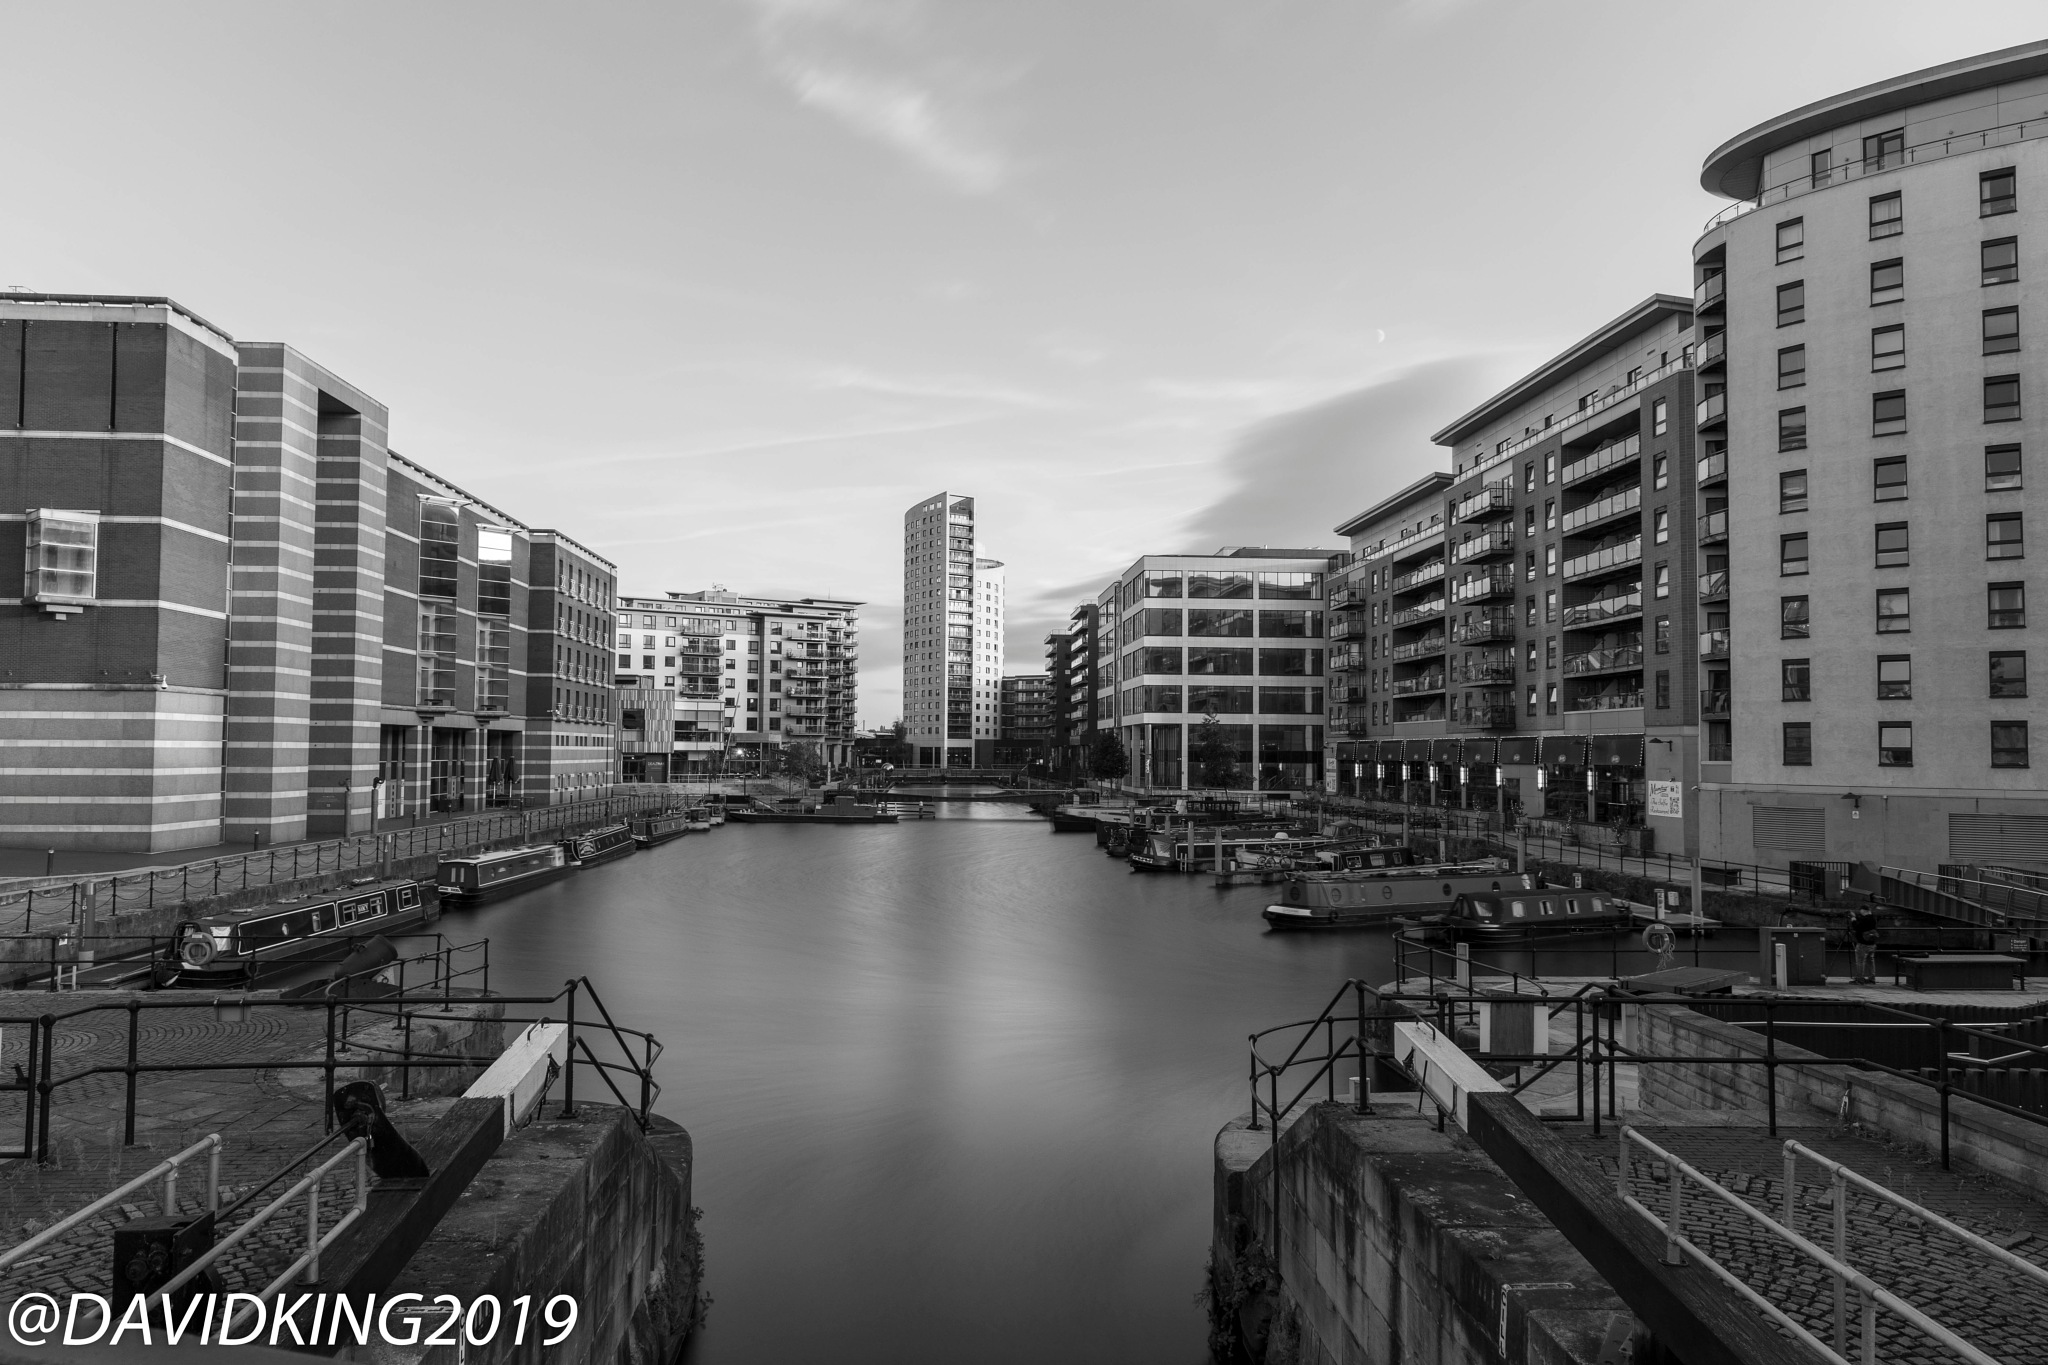 LeedS Dock by David King